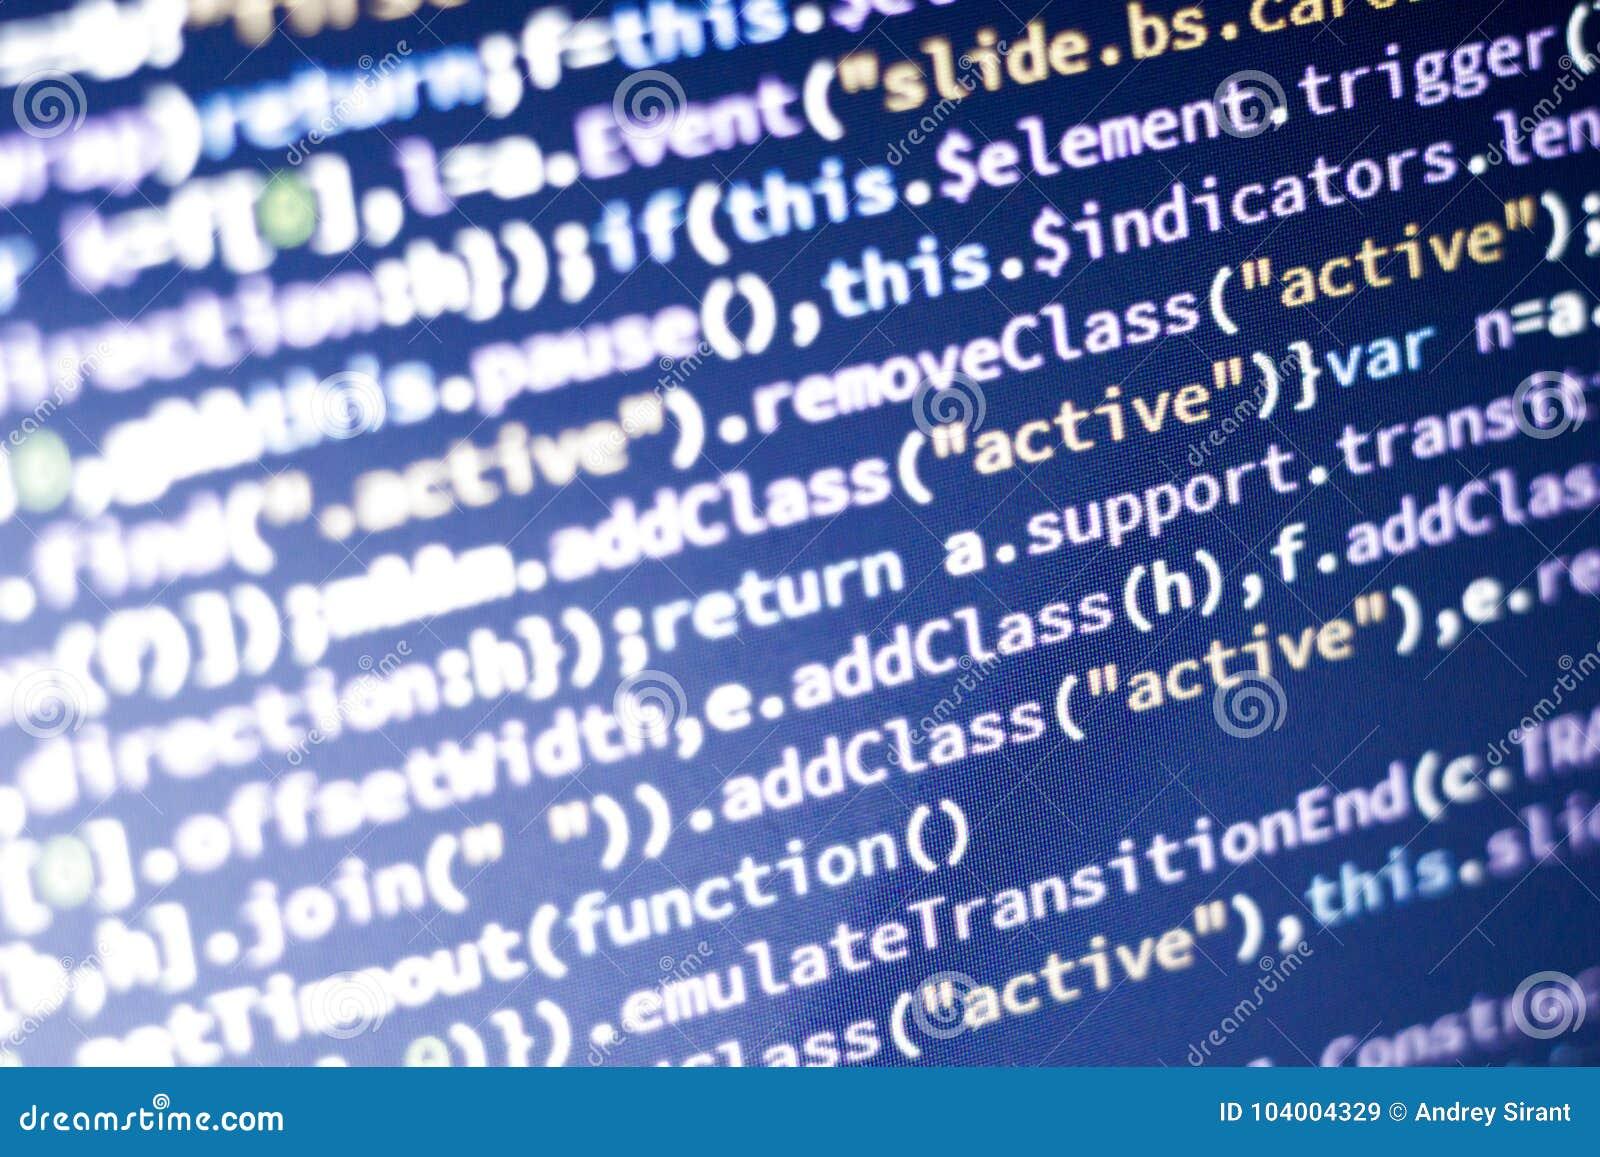 Javascript Code  Computer Programming Source Code  Abstract Screen